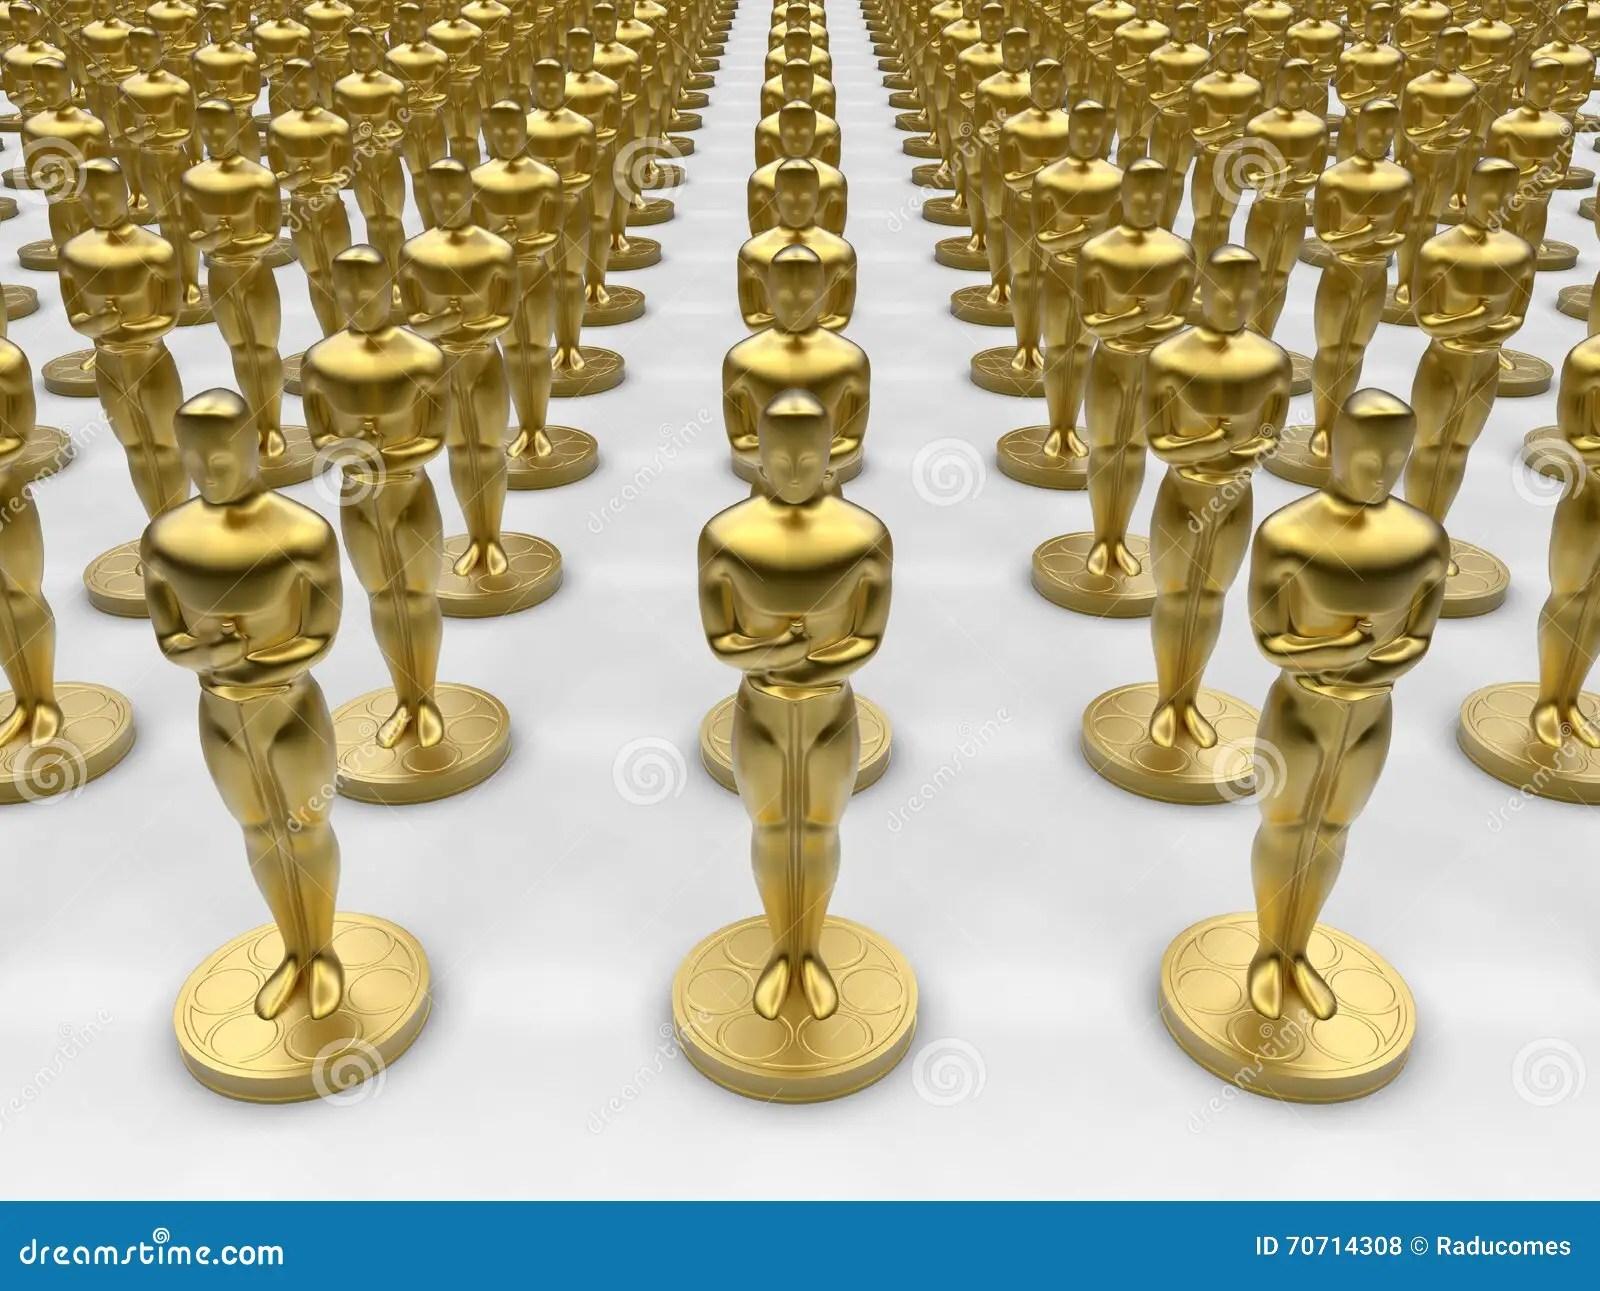 Grouch White And Art Clip White Black Grouch Oscar Black Clip And Art Oscar